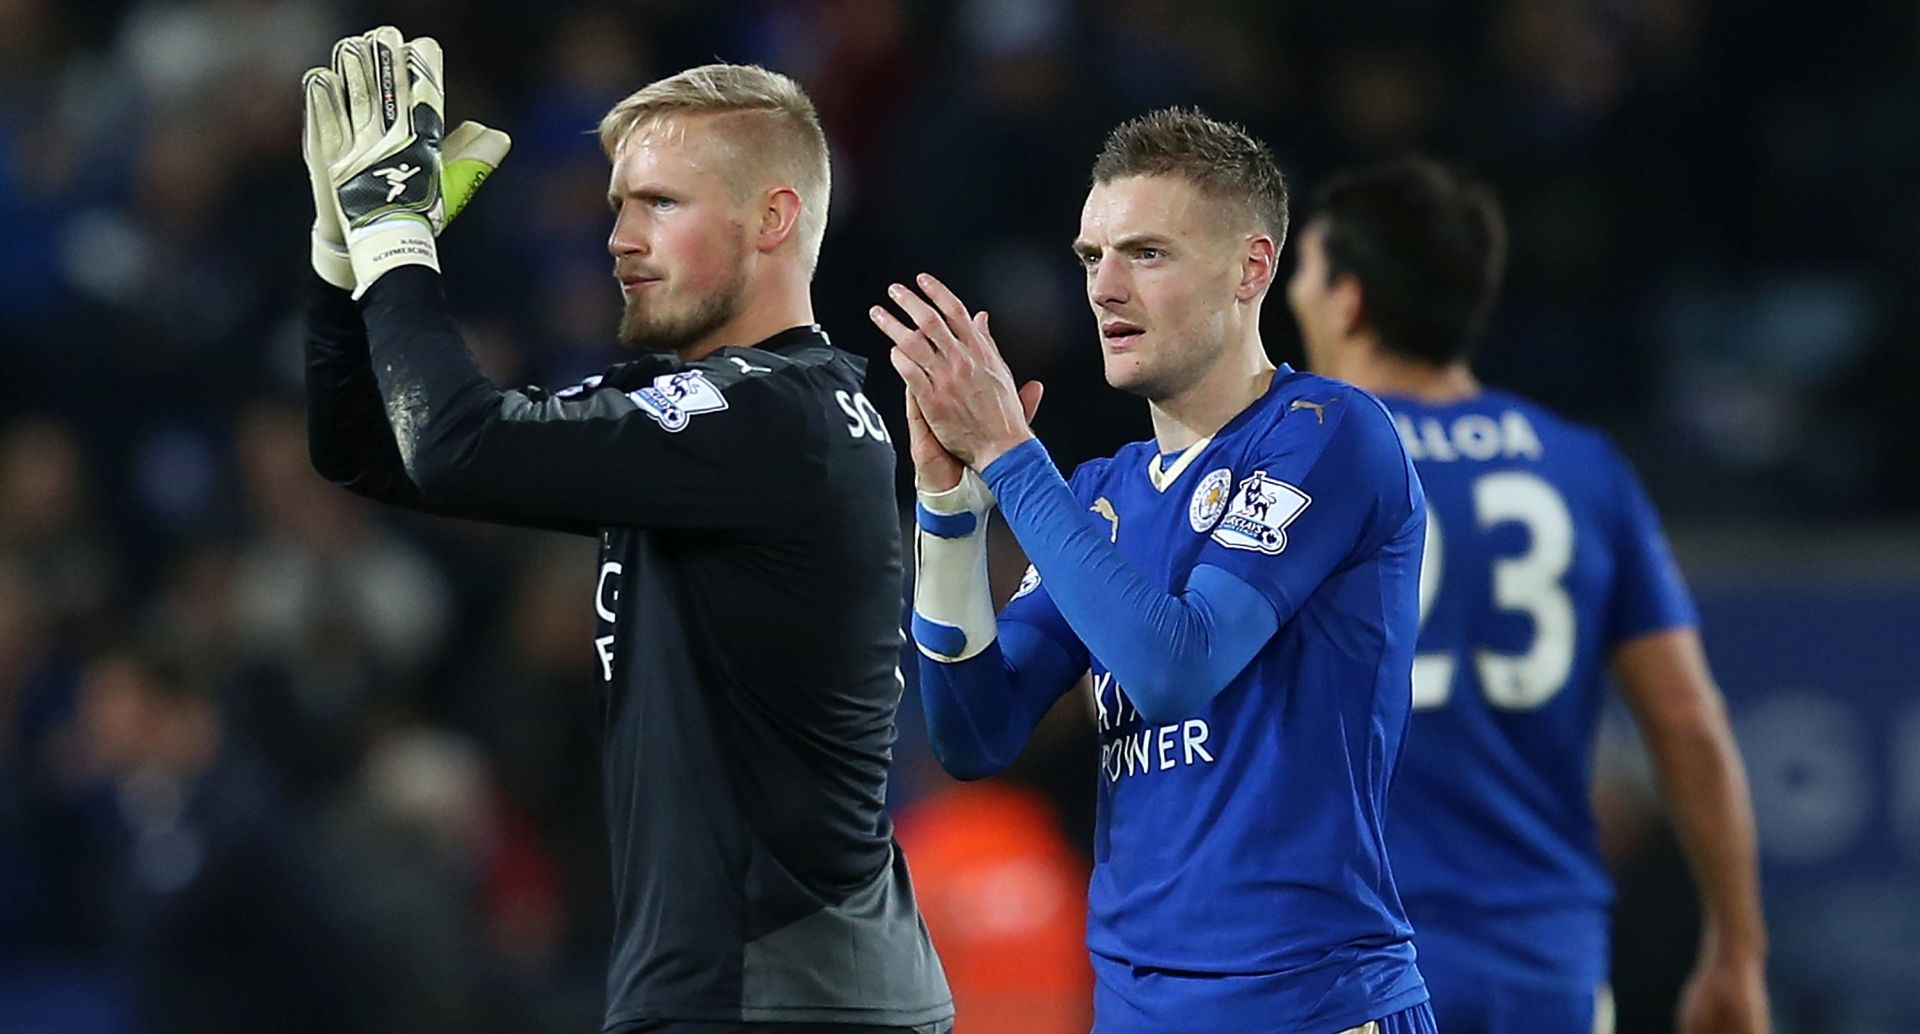 PRODUŽIO VJERNOST 'LISICAMA' Jamie Vardy ostaje u Leicesteru do ljeta 2019.